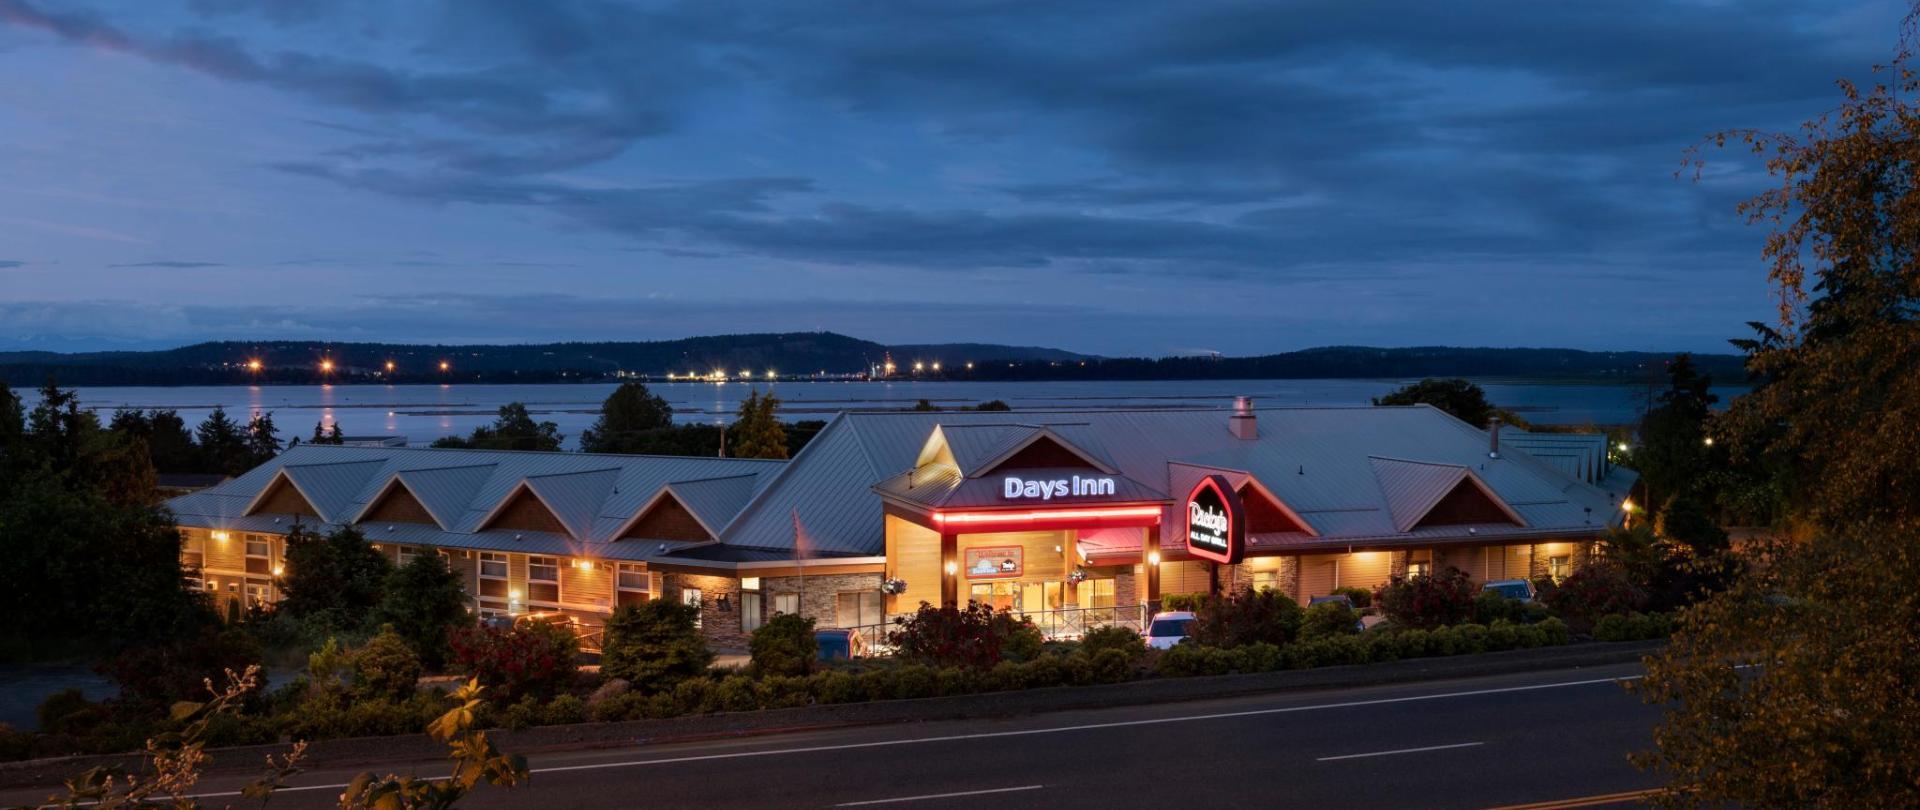 Days Inn Nanaimo - Exterior - 1446715.jpg